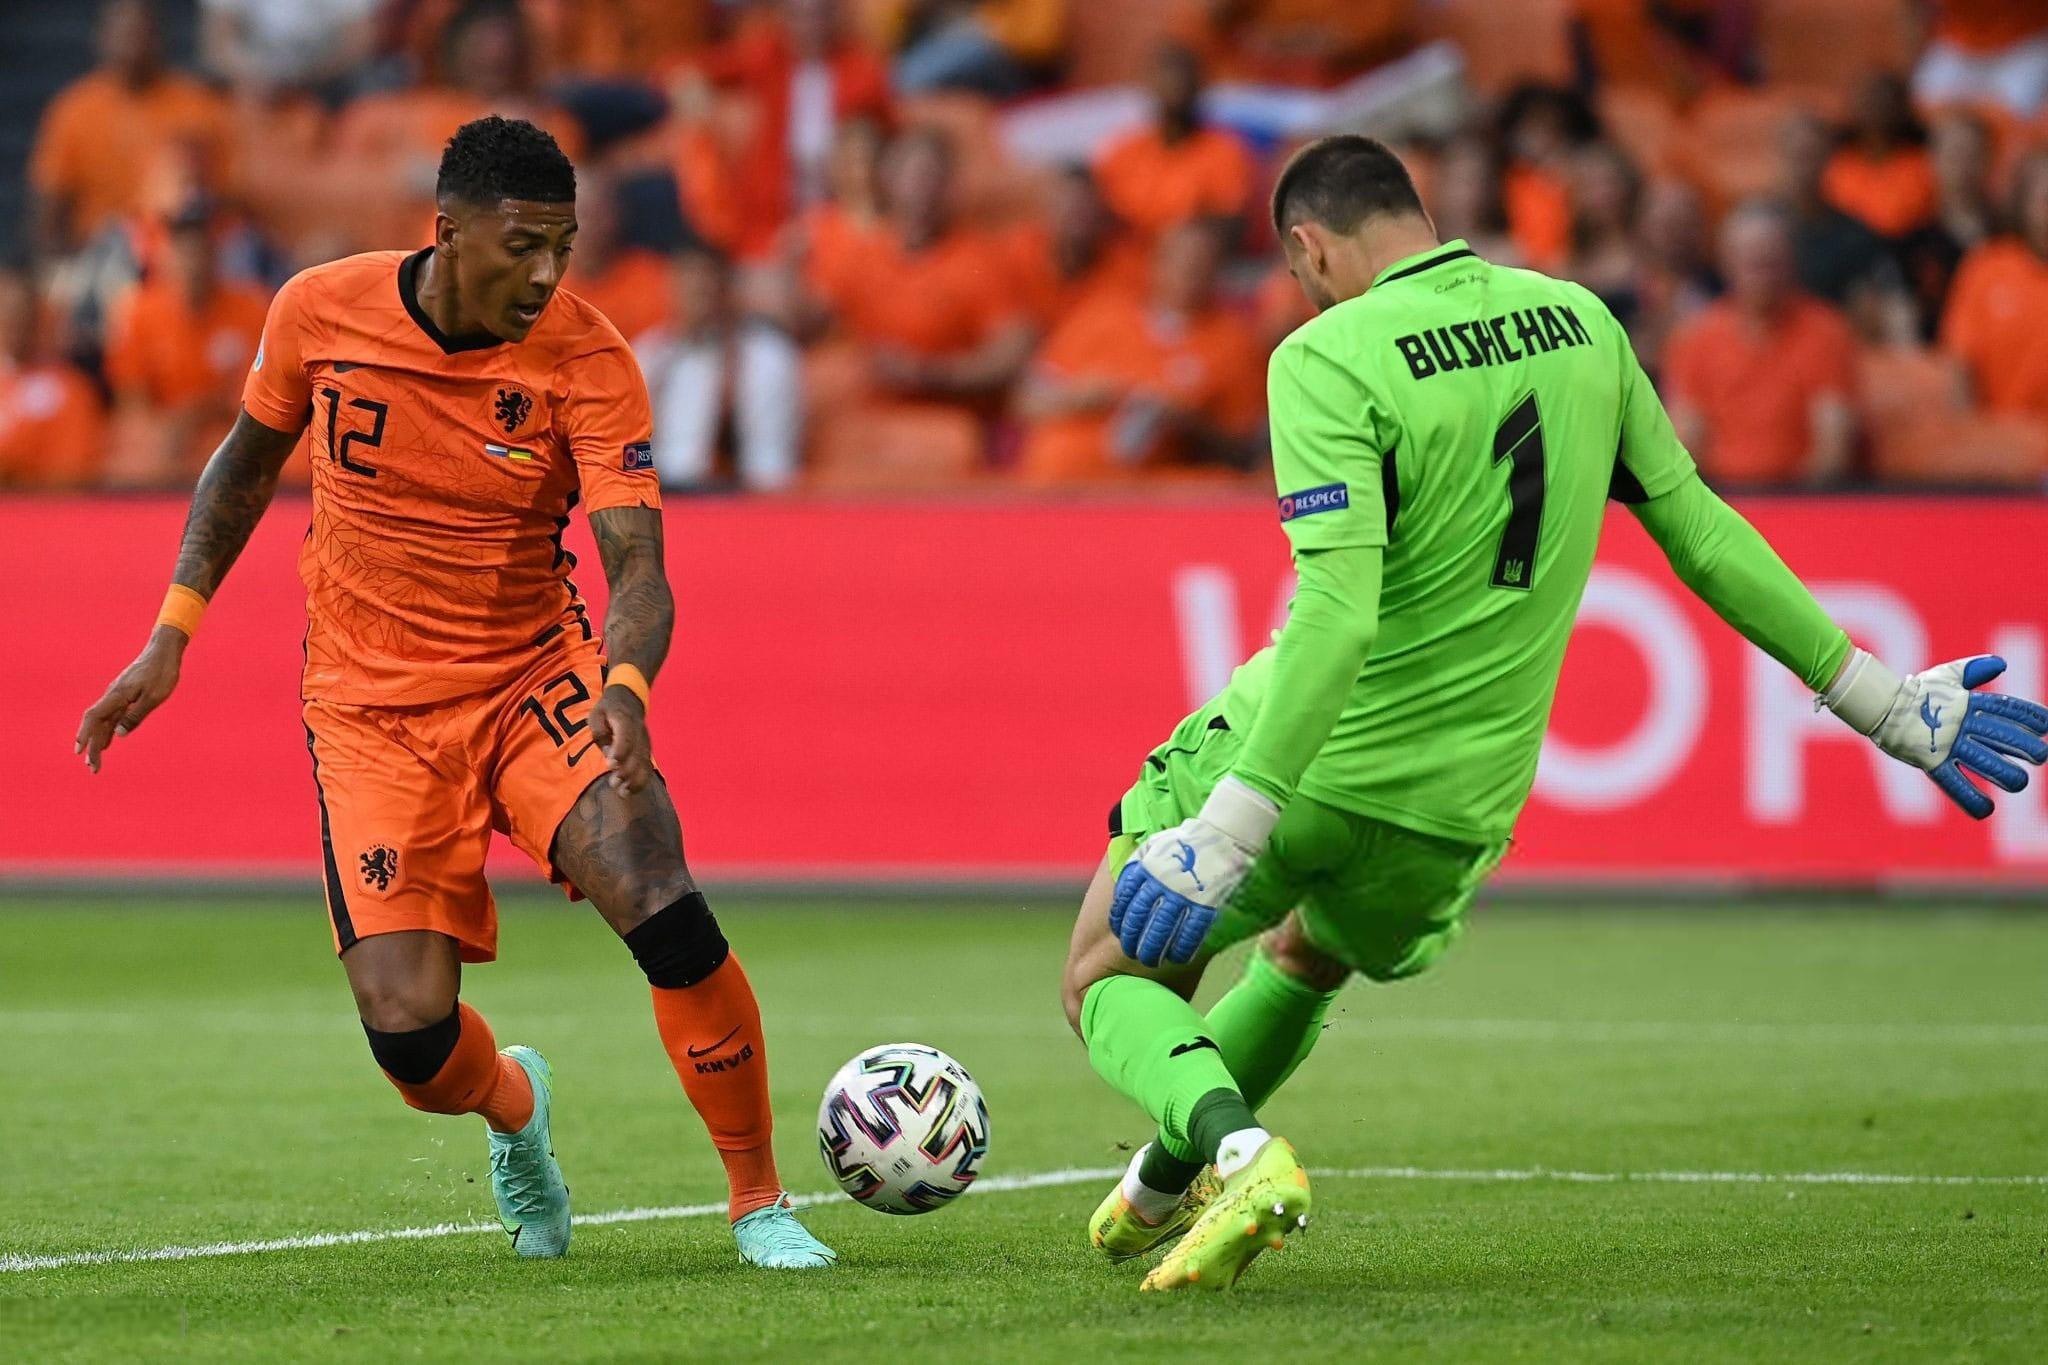 Heorhiy Bushchan wearing Brave GK Rain Pro gloves against                     the Netherlands national team